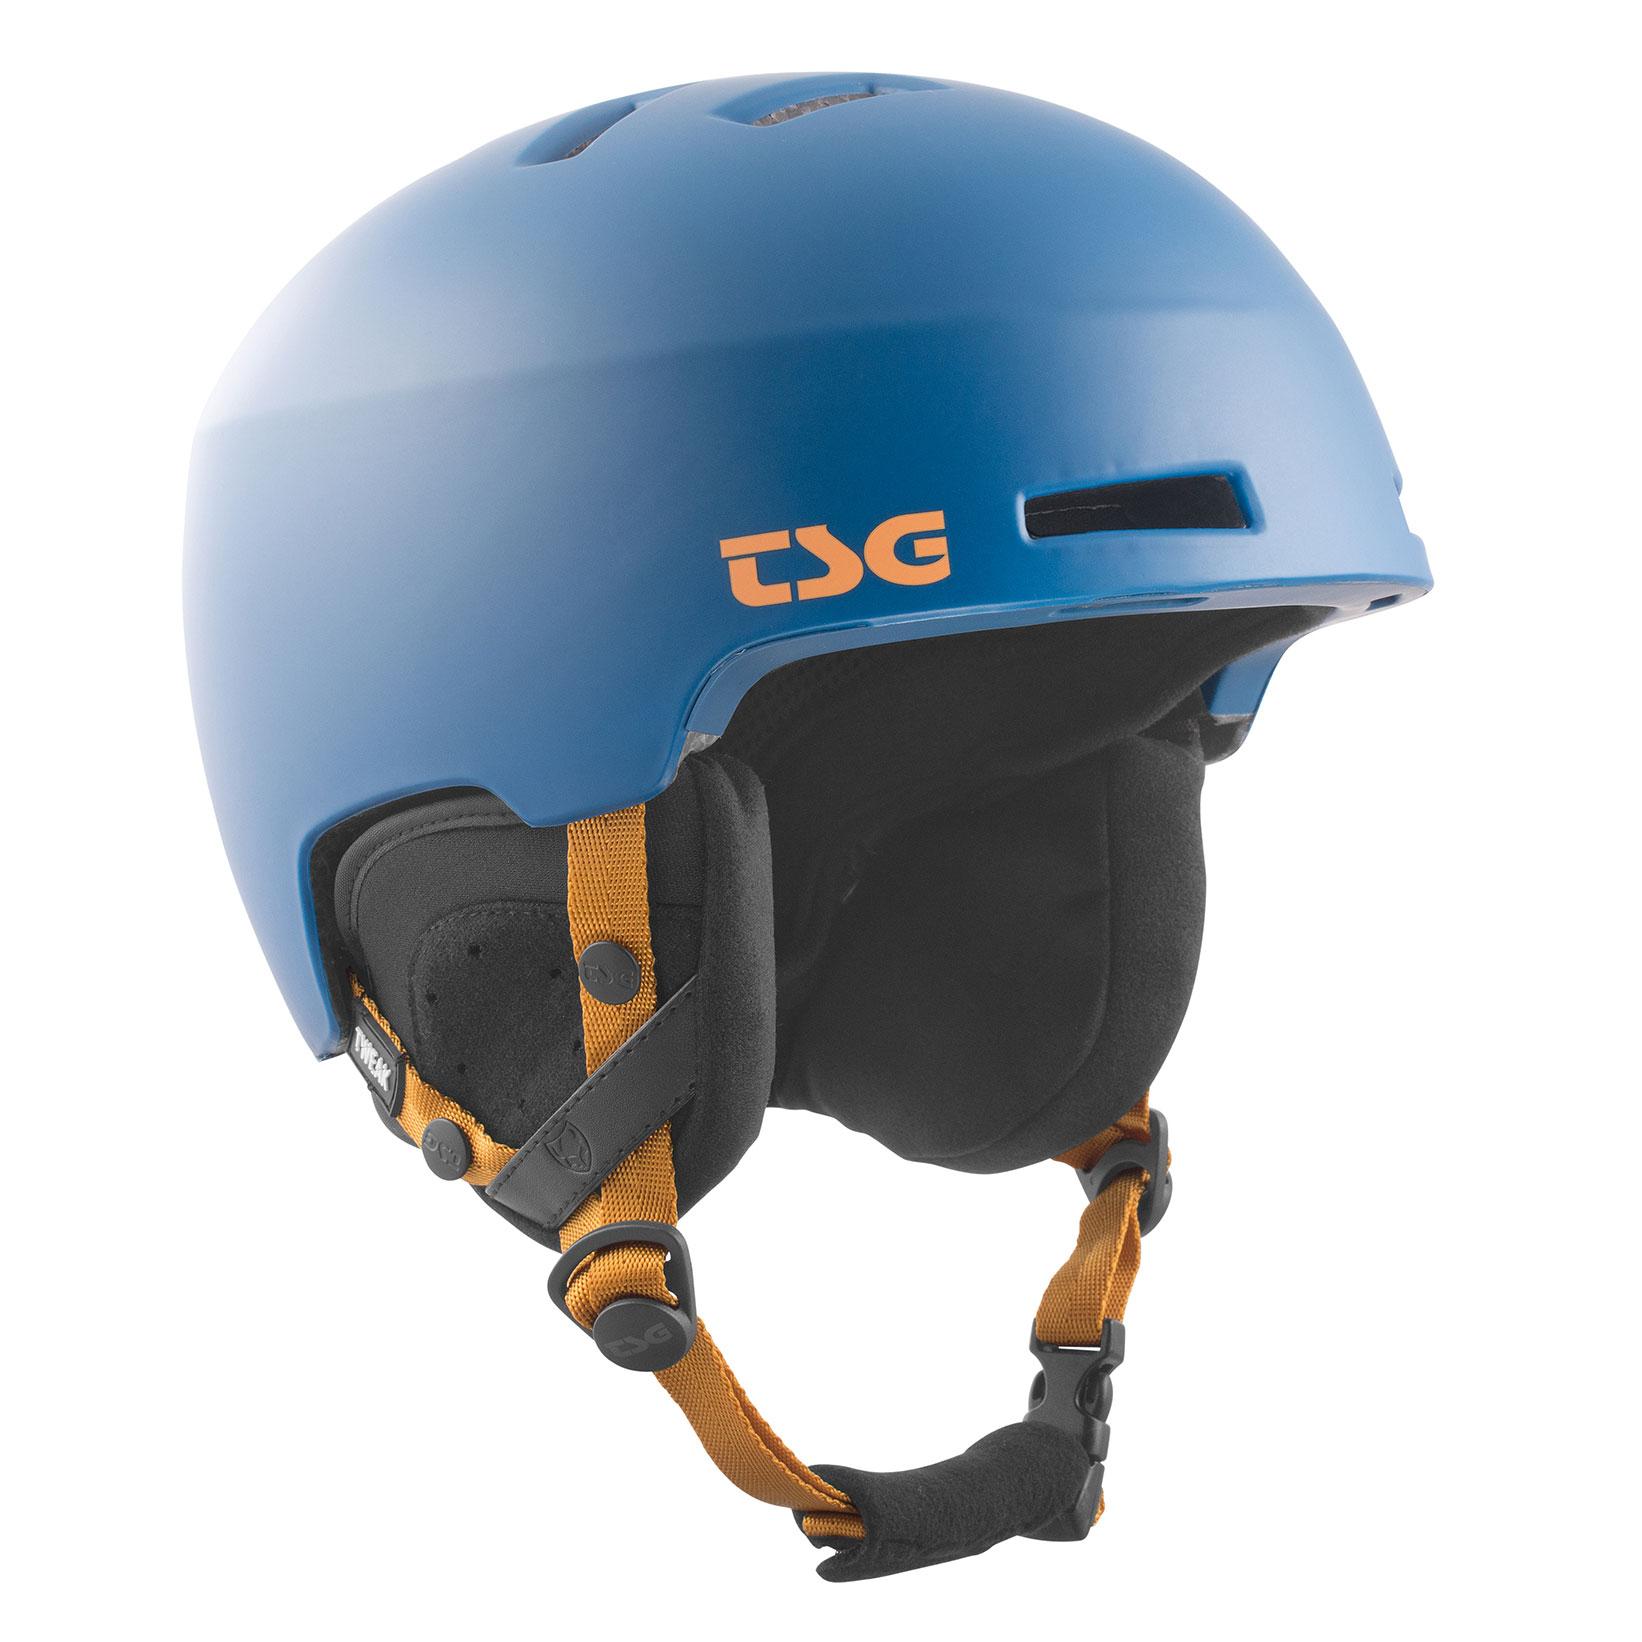 TSG Snowboardhelm Konik Solid Color